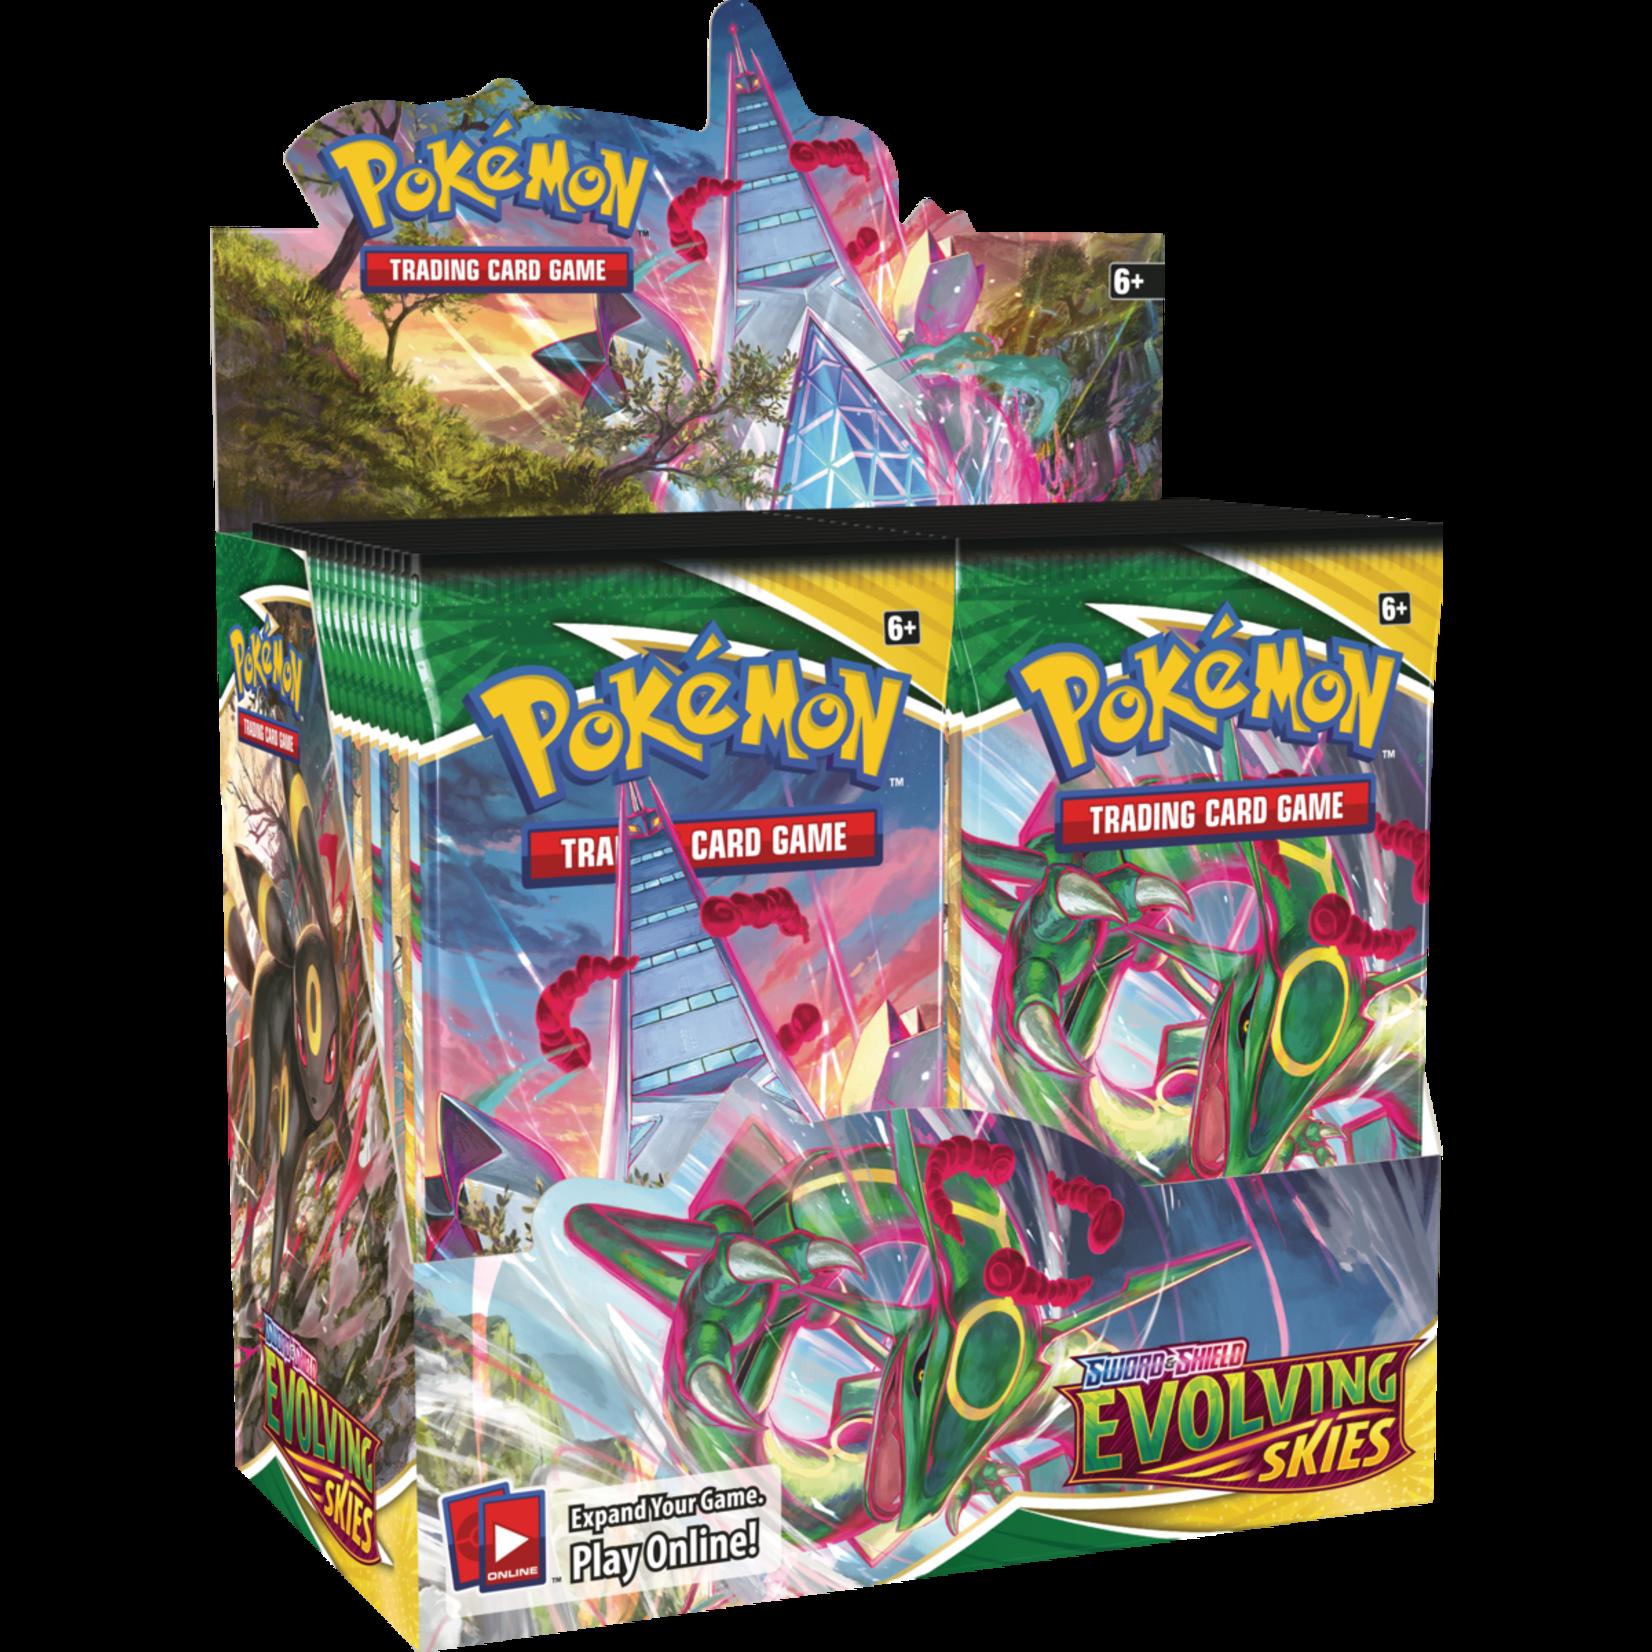 Pokemon International Pokemon Trading Card Game: Evolving Skies Booster Box